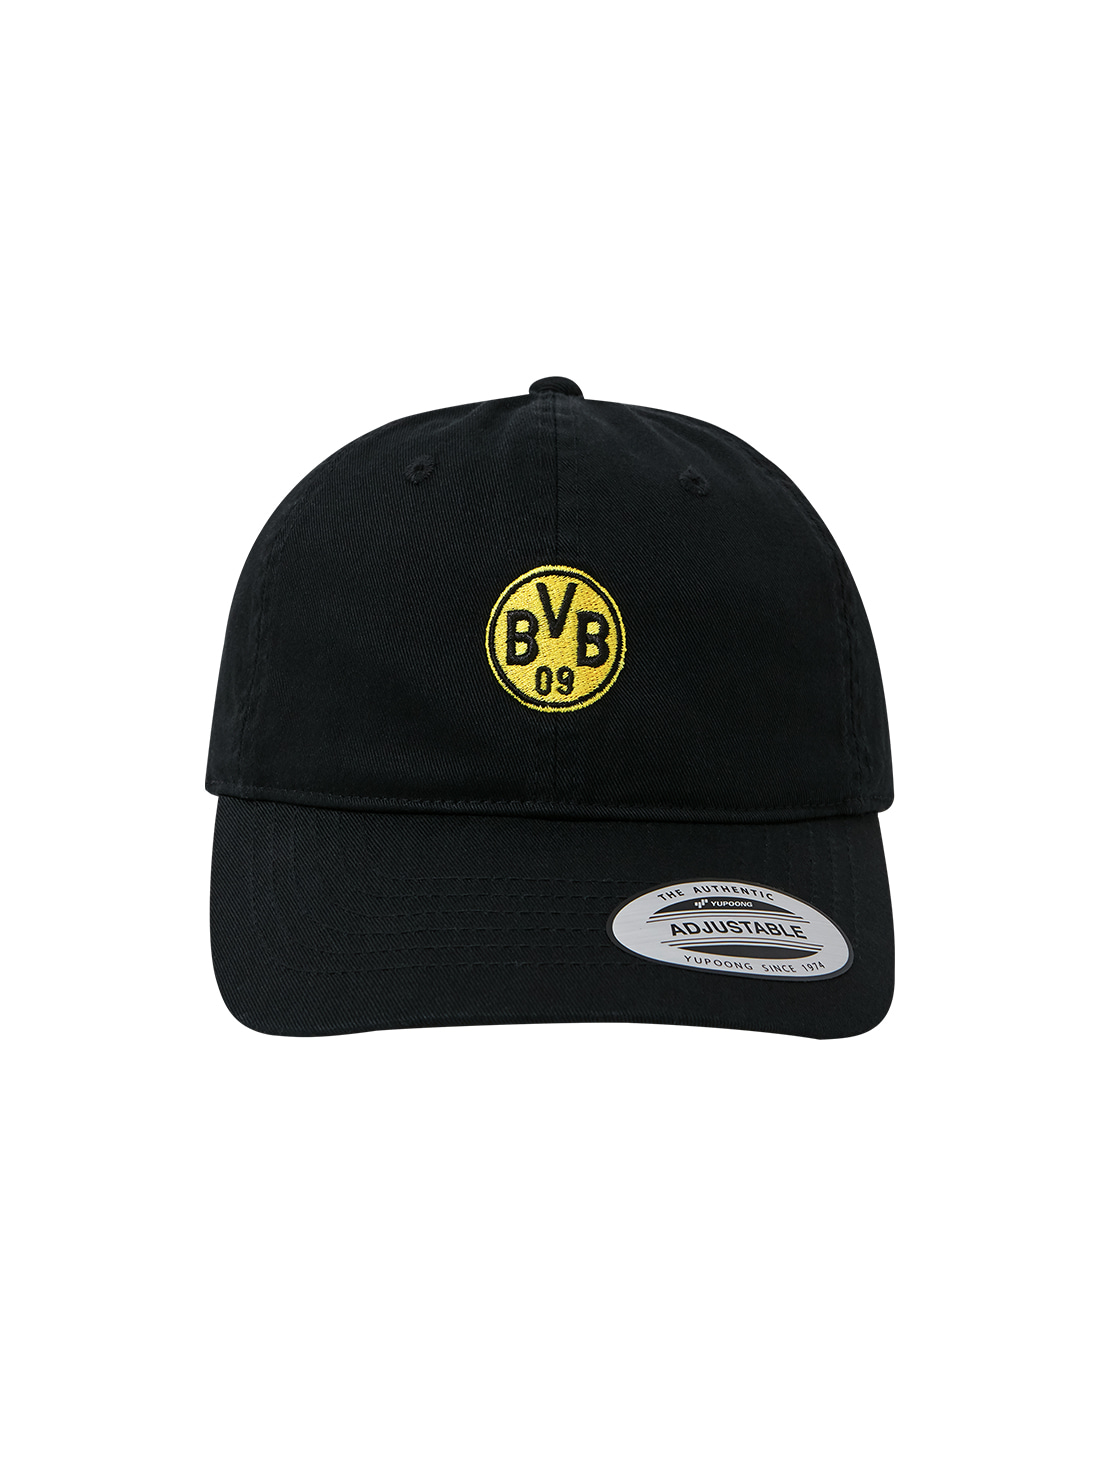 BVB STRAP LOGO CAP